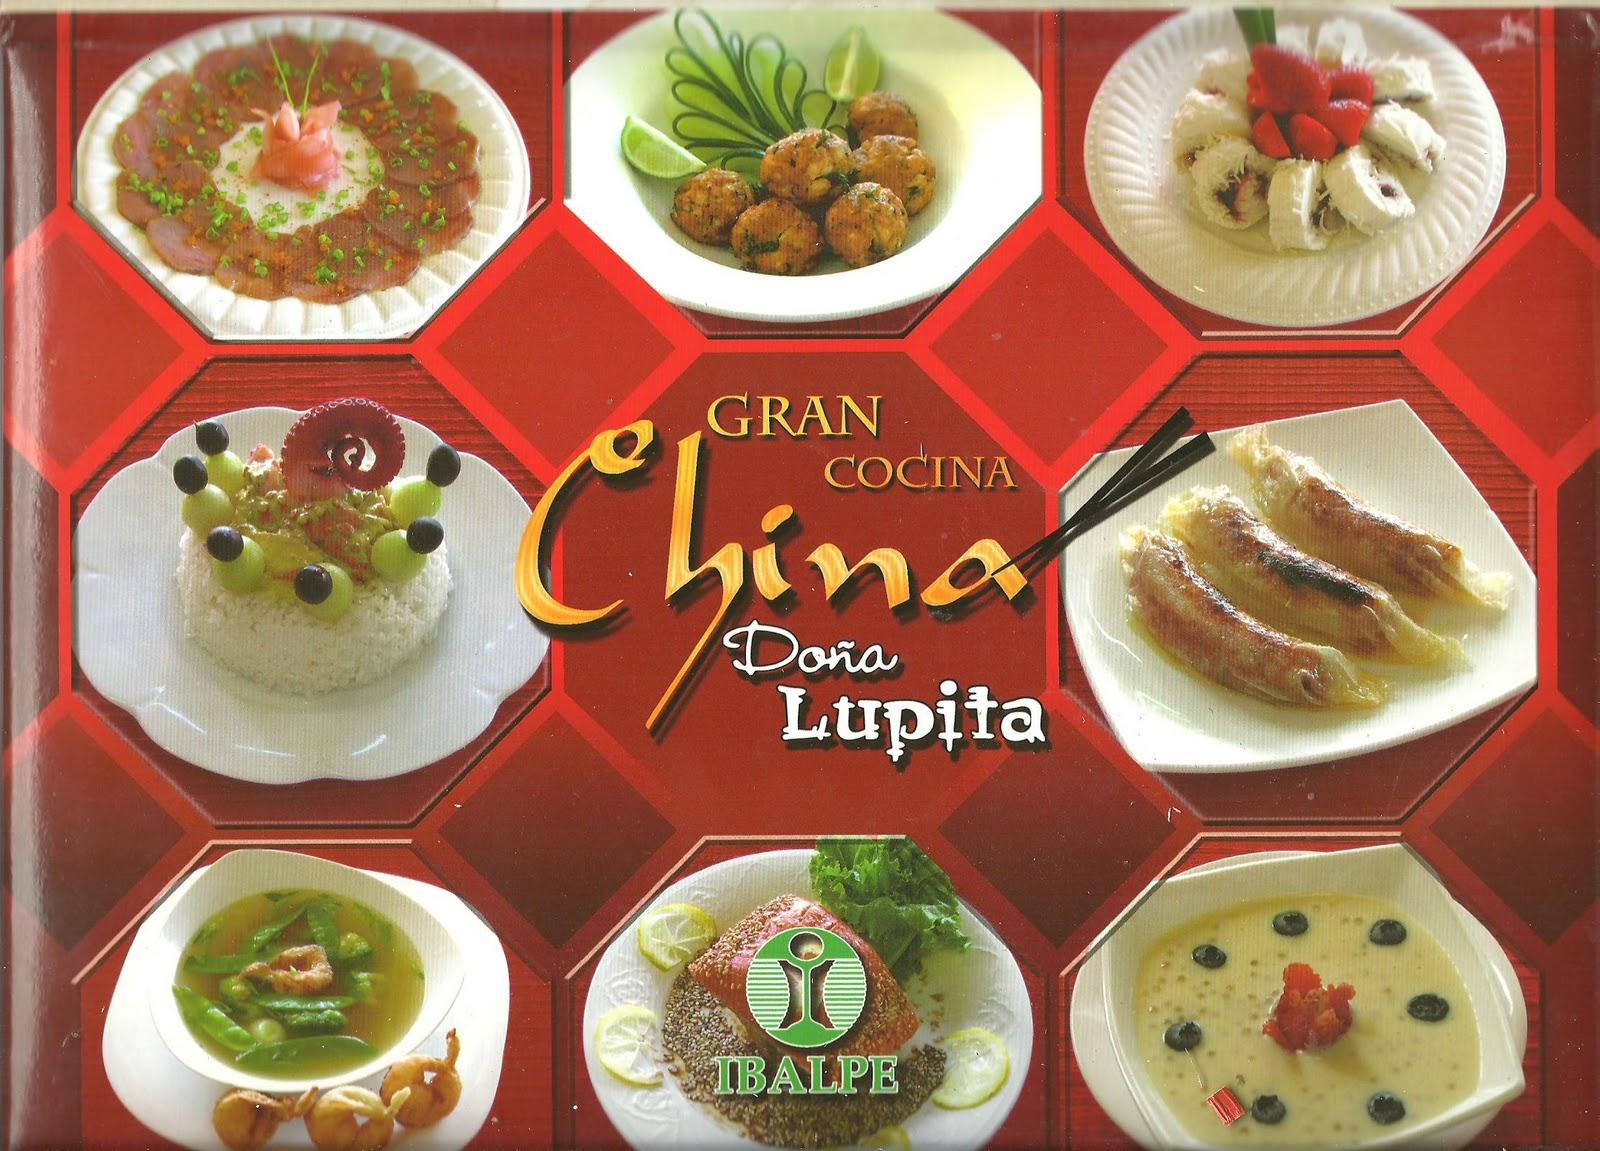 Libros dvds cd roms enciclopedias educaci n preescolar for Enciclopedia de cocina pdf